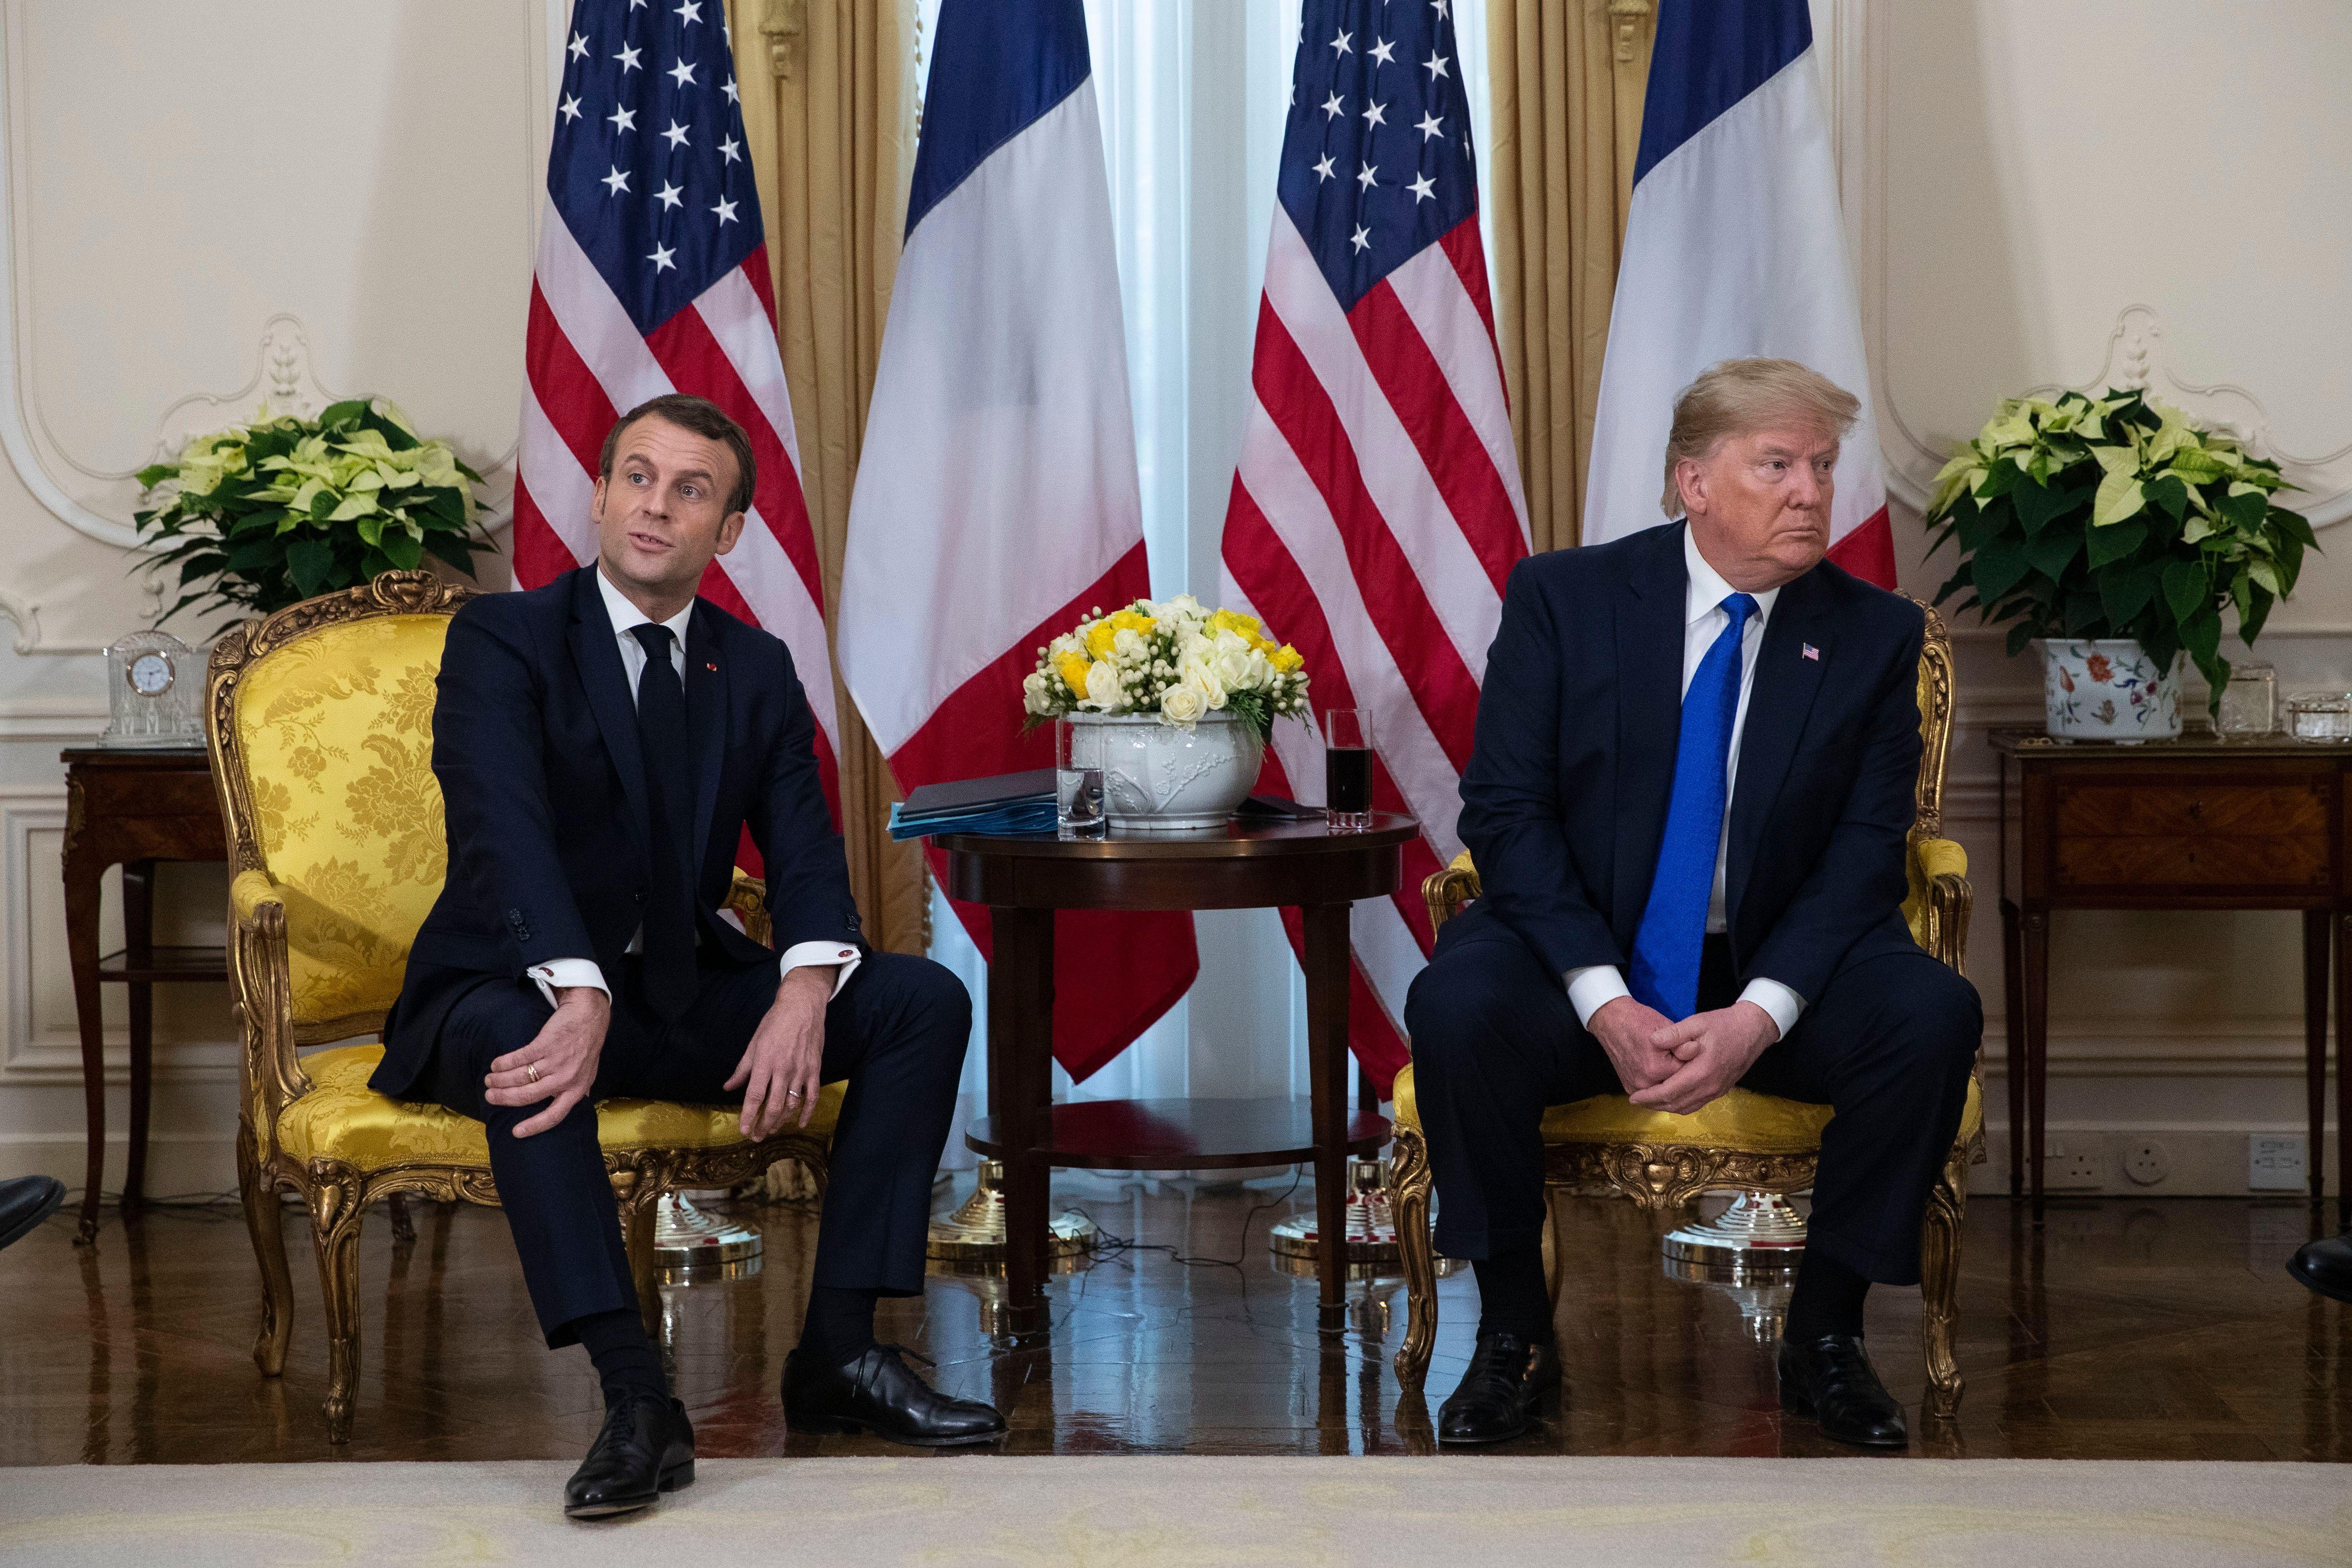 Donald Trump, Emmanuel Macron. President Donald Trump meets French President Emmanuel Macron at Winfield House during the NATO summit, in LondonNATO Trump, London, United Kingdom - 03 Dec 2019